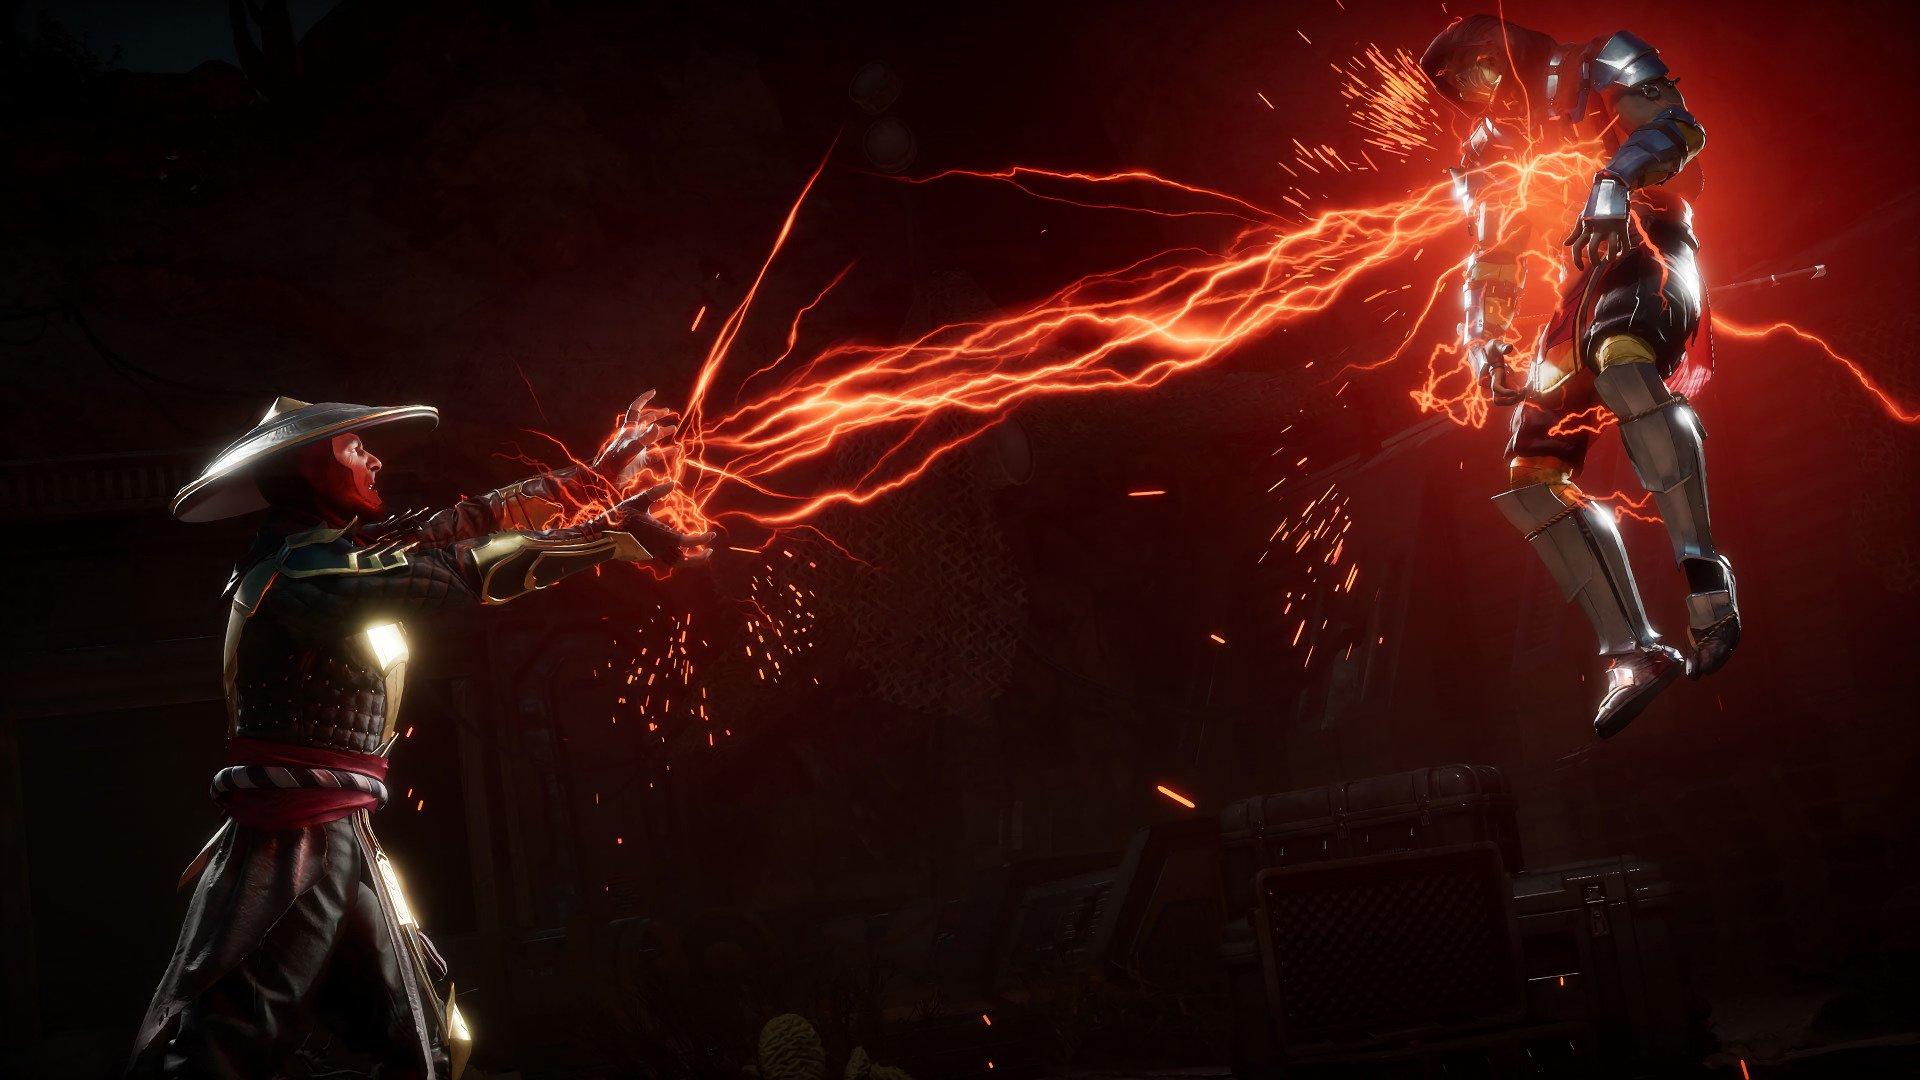 Mortal kombat 11 hd wallpaper background image - Mortal kombat 11 wallpaper ...